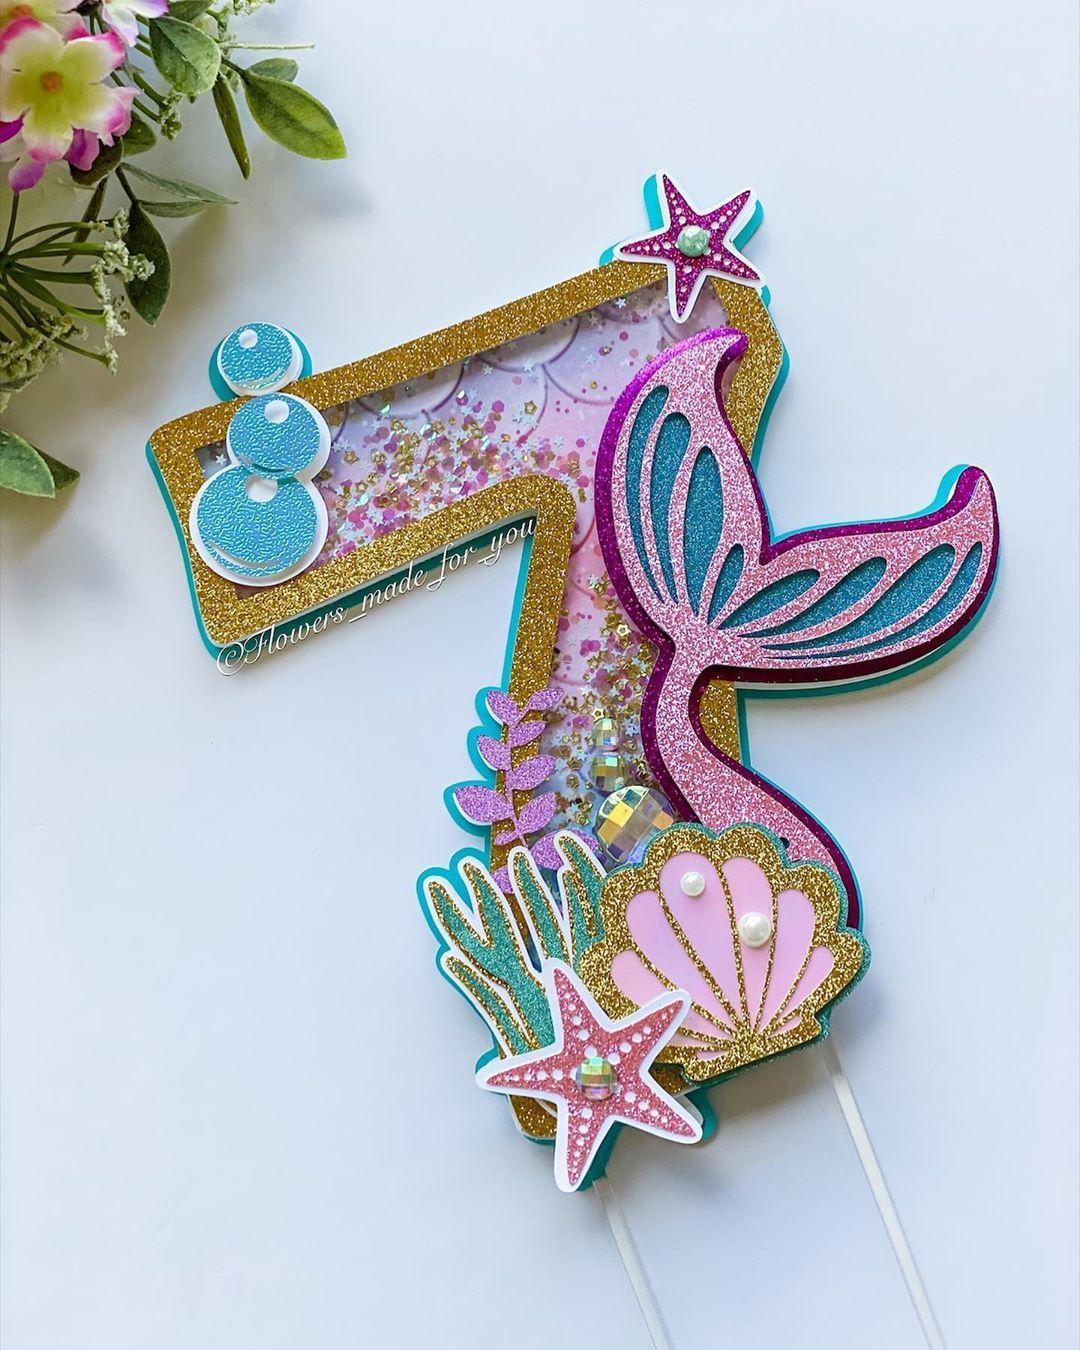 Carolina alzate on instagram mermaid cake topper